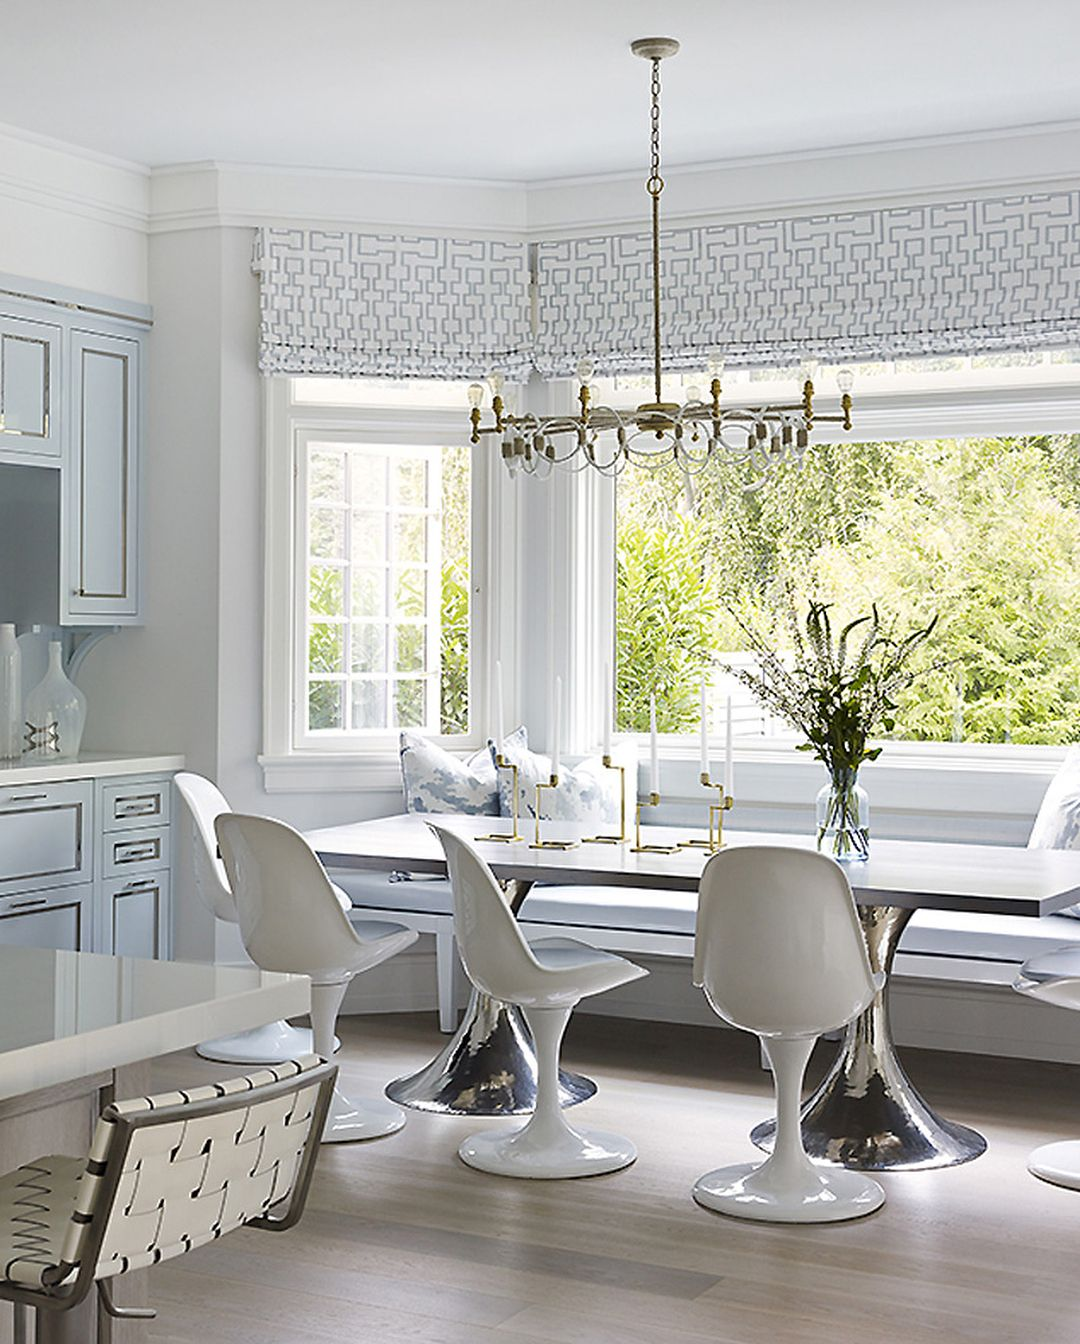 Coastalhome Interior Design: Traditional Meets Modern Hamptons. Quite Love Those Steel